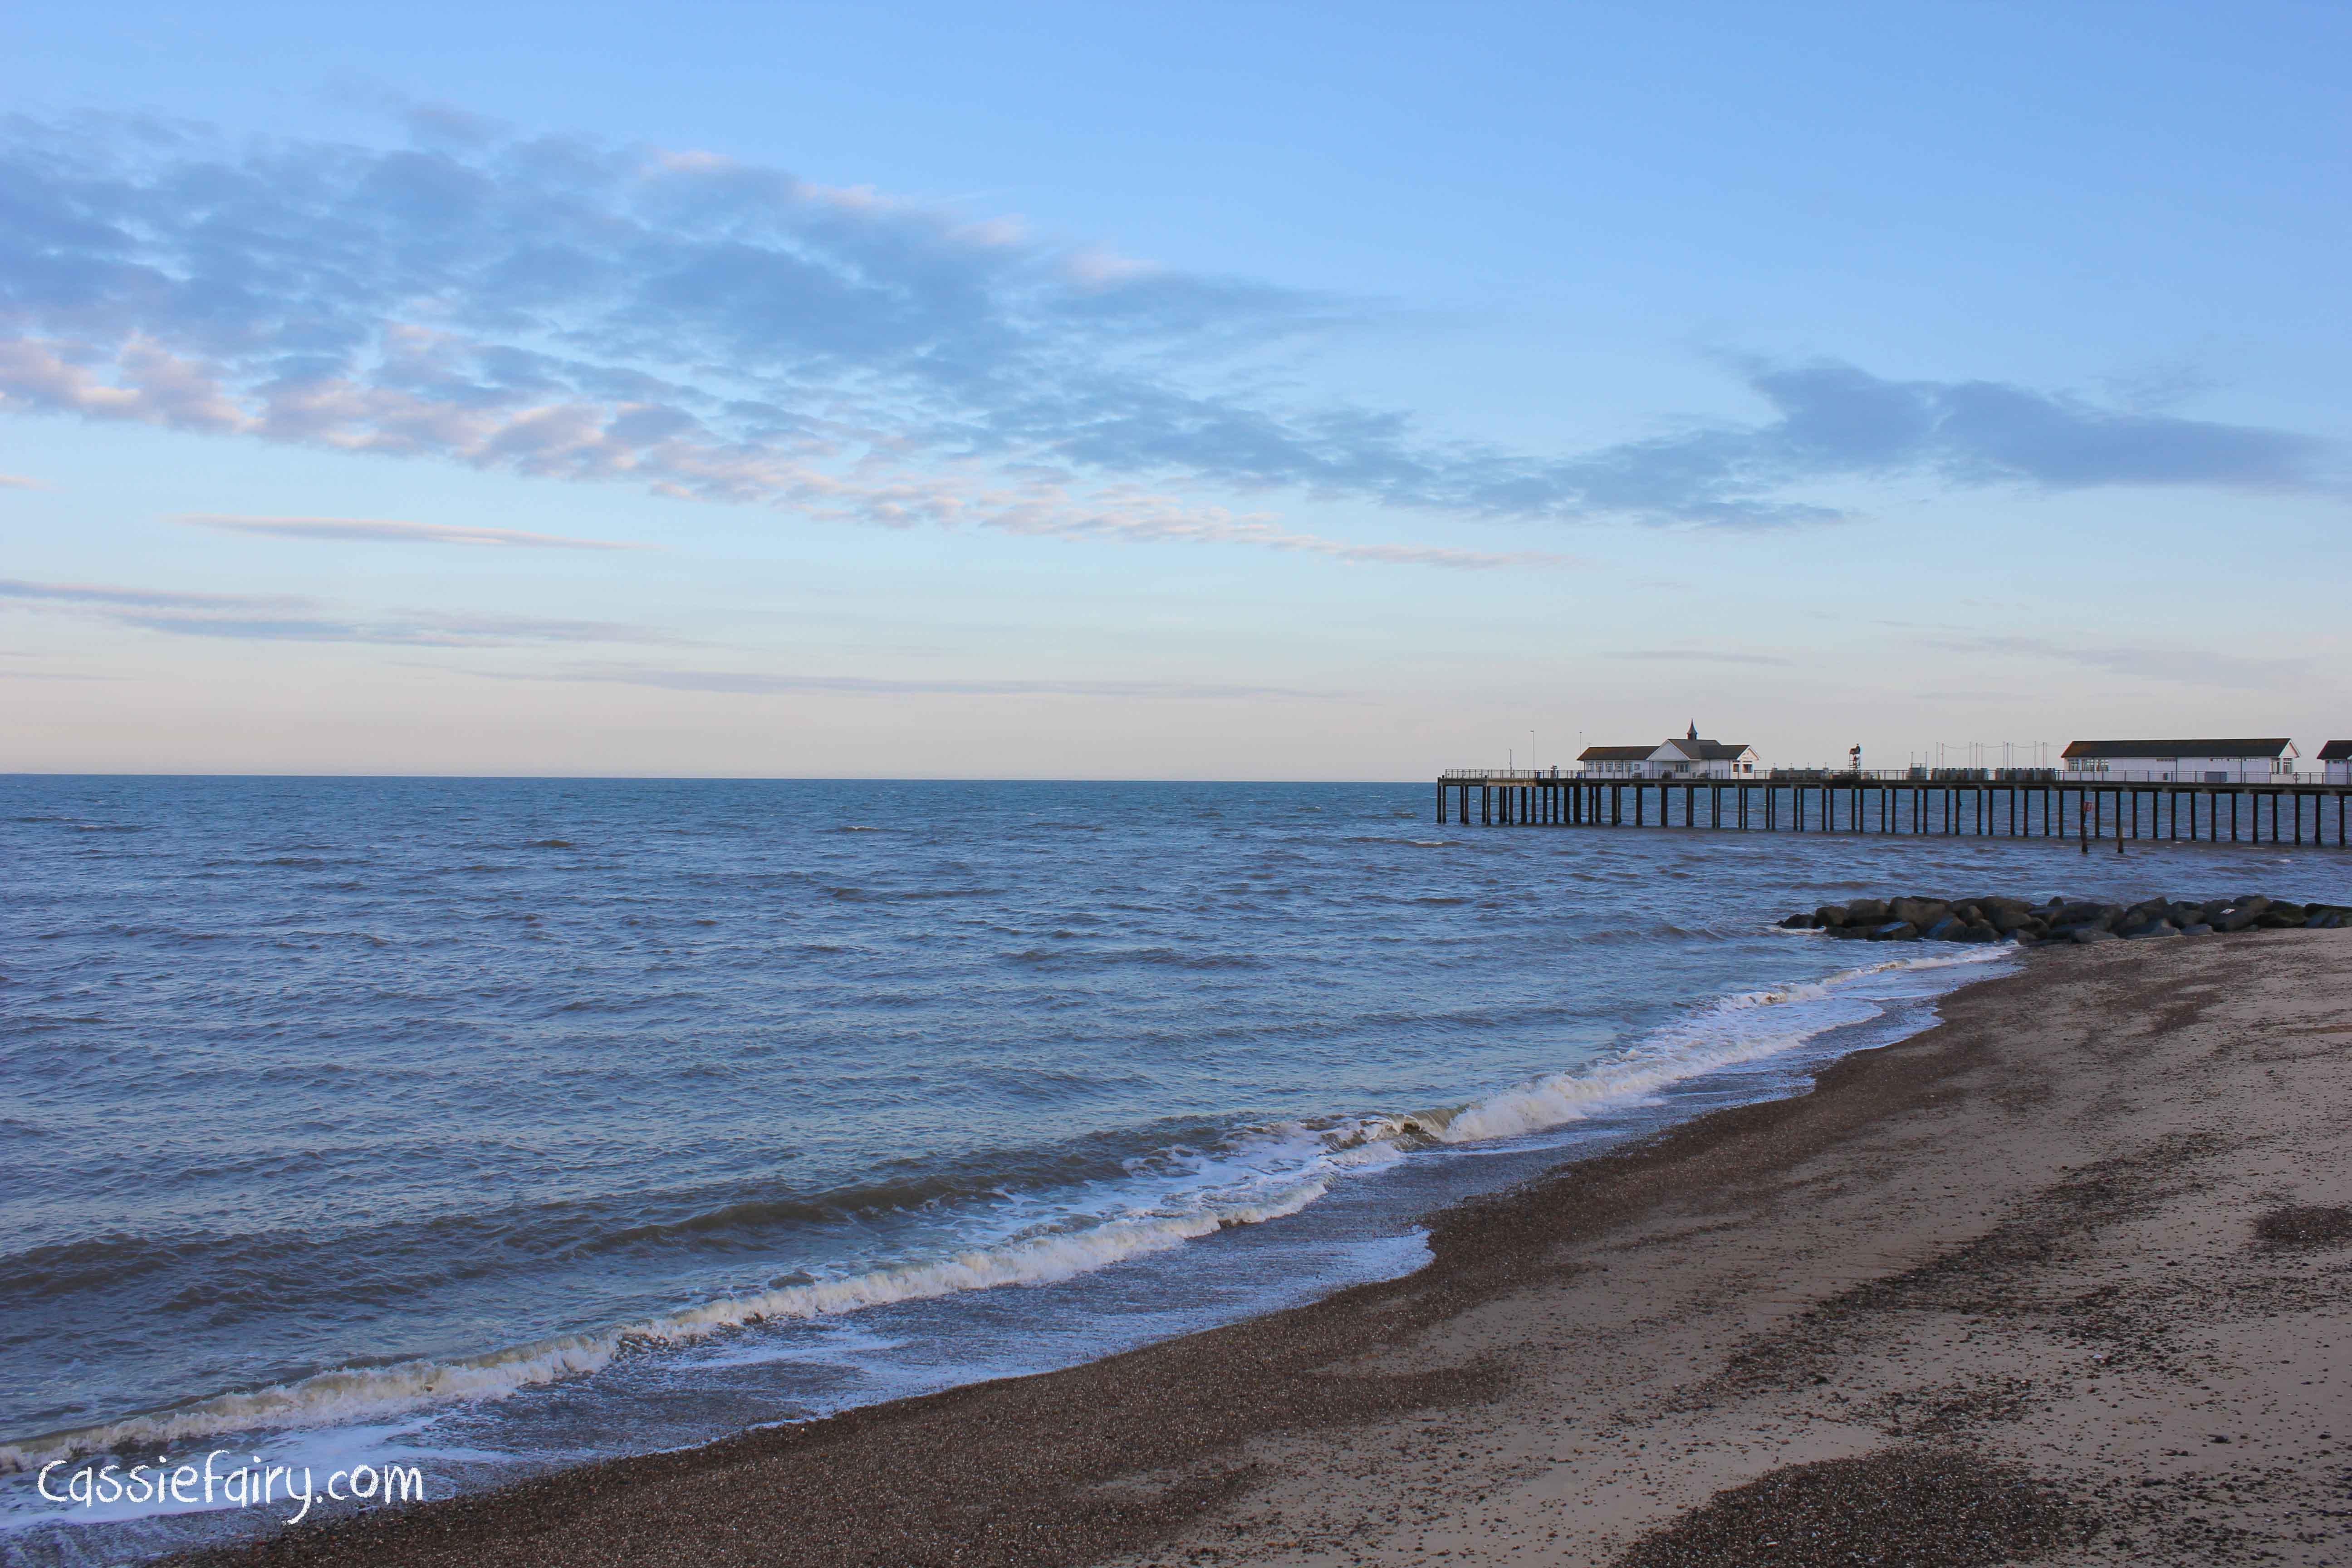 Photos of the Suffolk Coast - Southwold pier